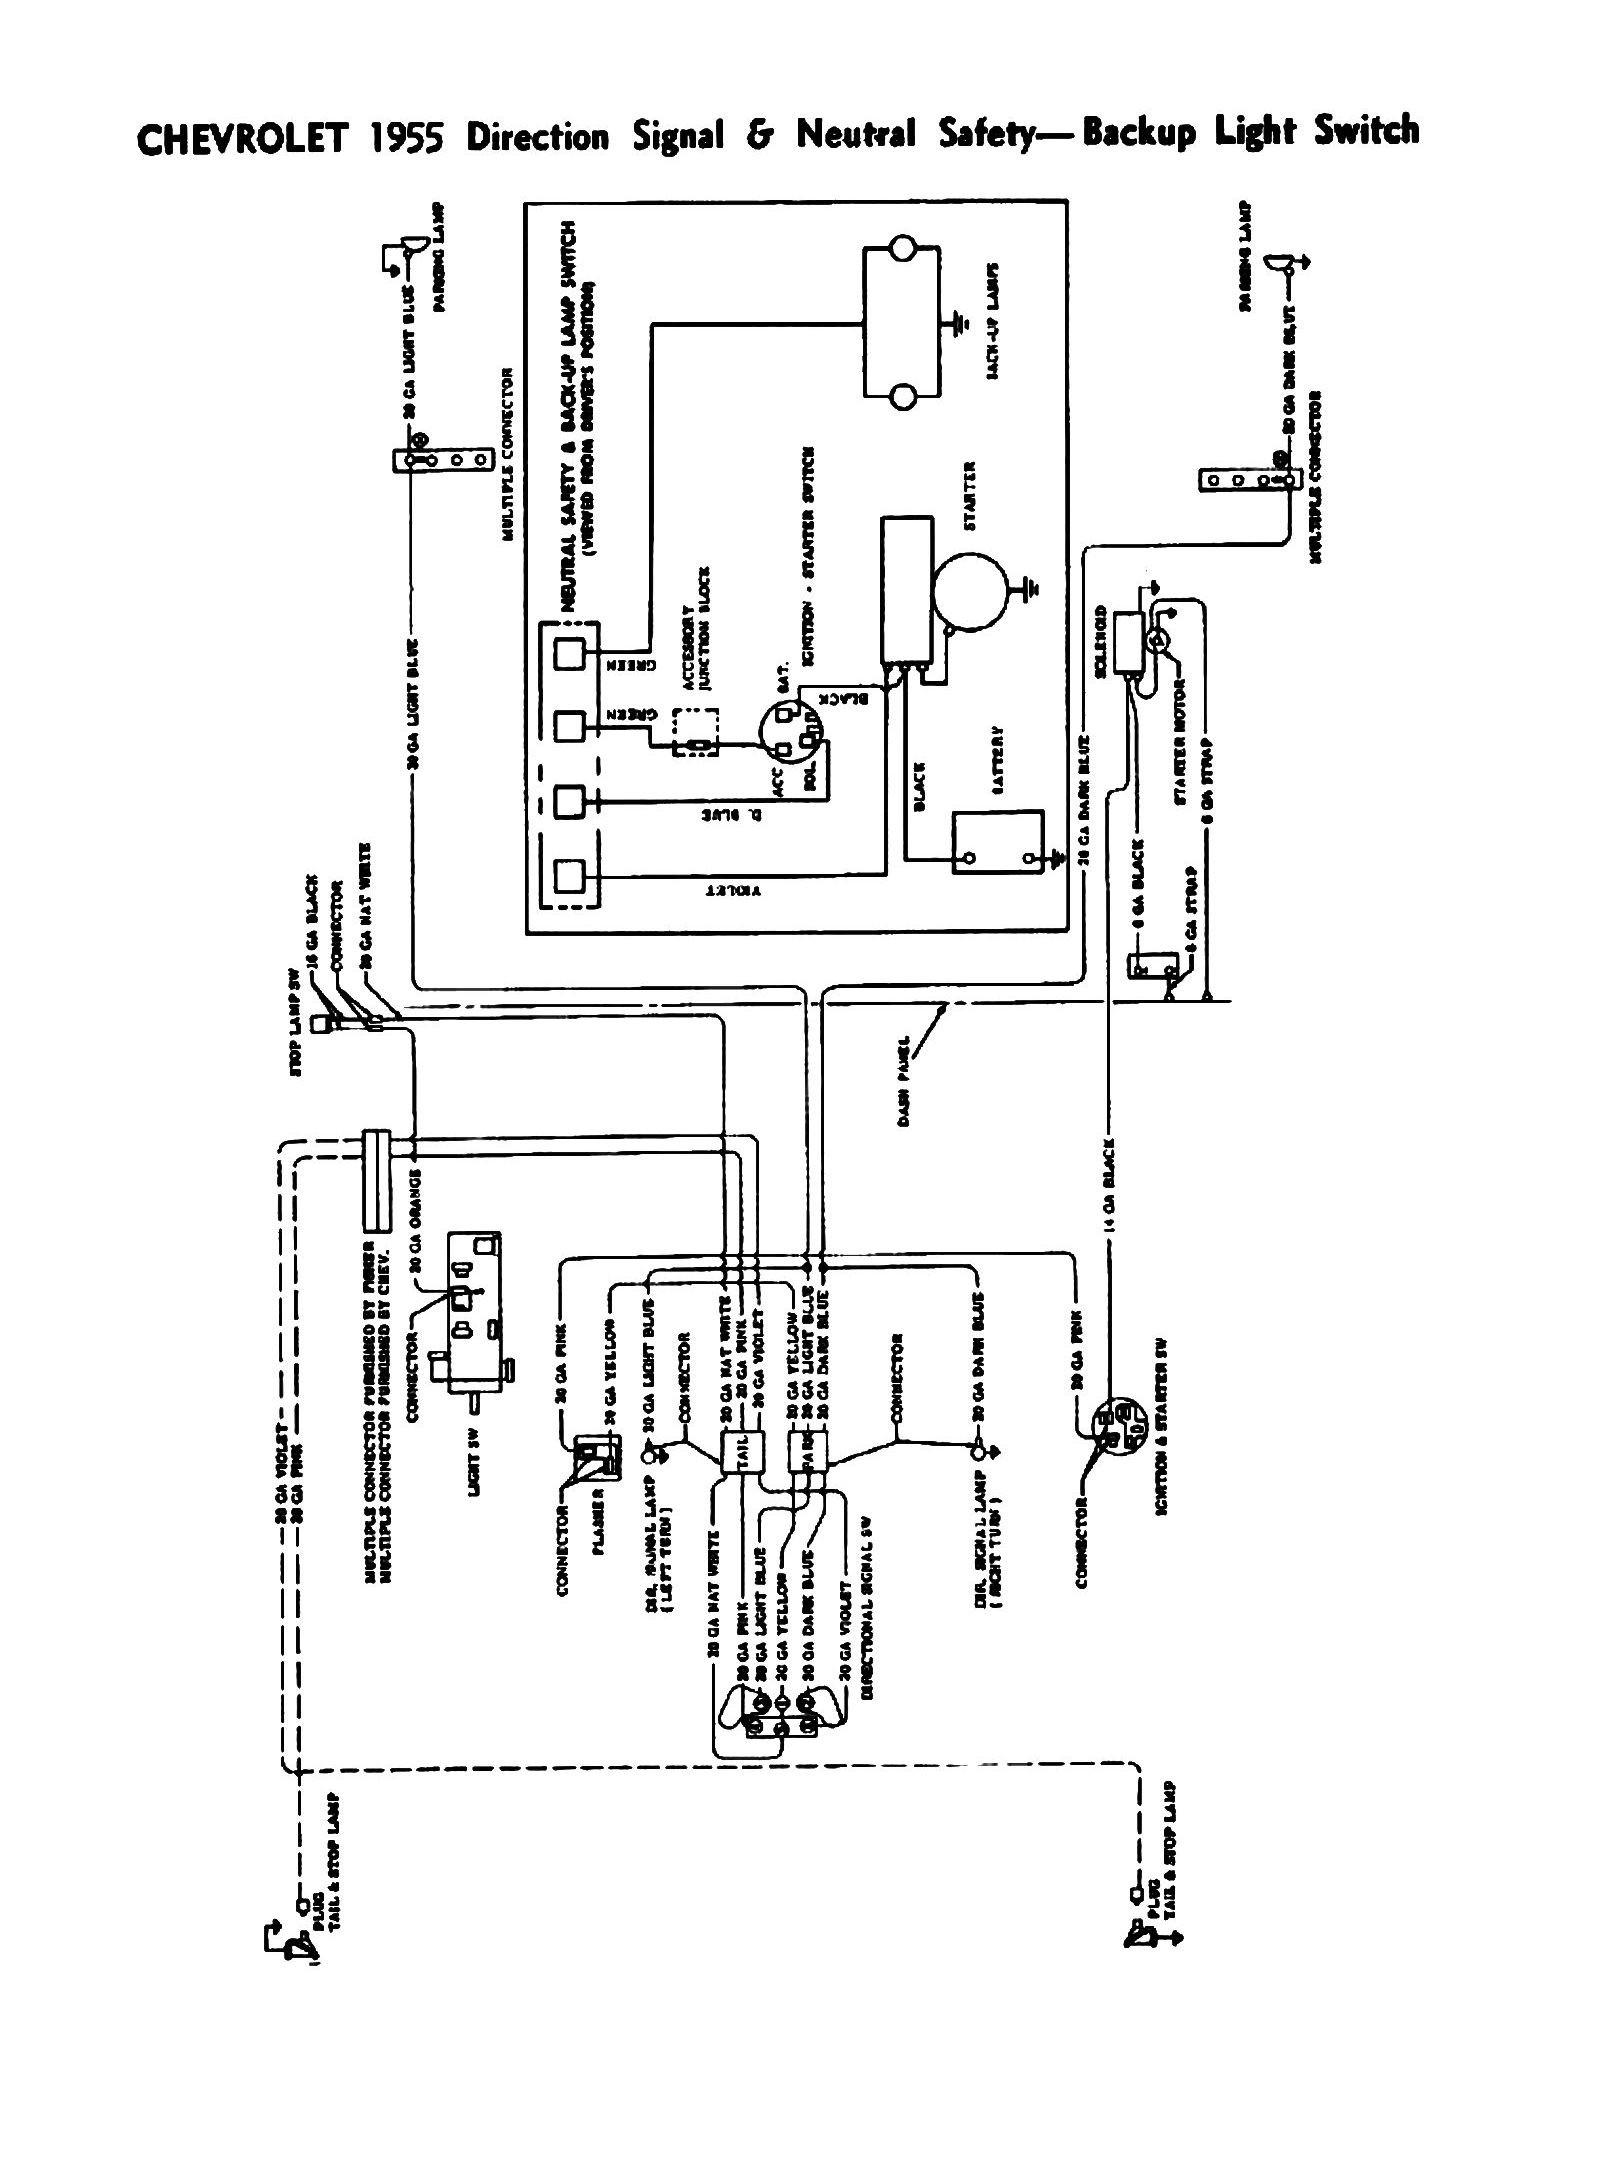 S10 Blower Motor Wiring Diagram : blower, motor, wiring, diagram, Chevy, Heater, Wiring, Diagram, Database, Rotation, Chin-wind, Chin-wind.ciaodiscotecaitaliana.it